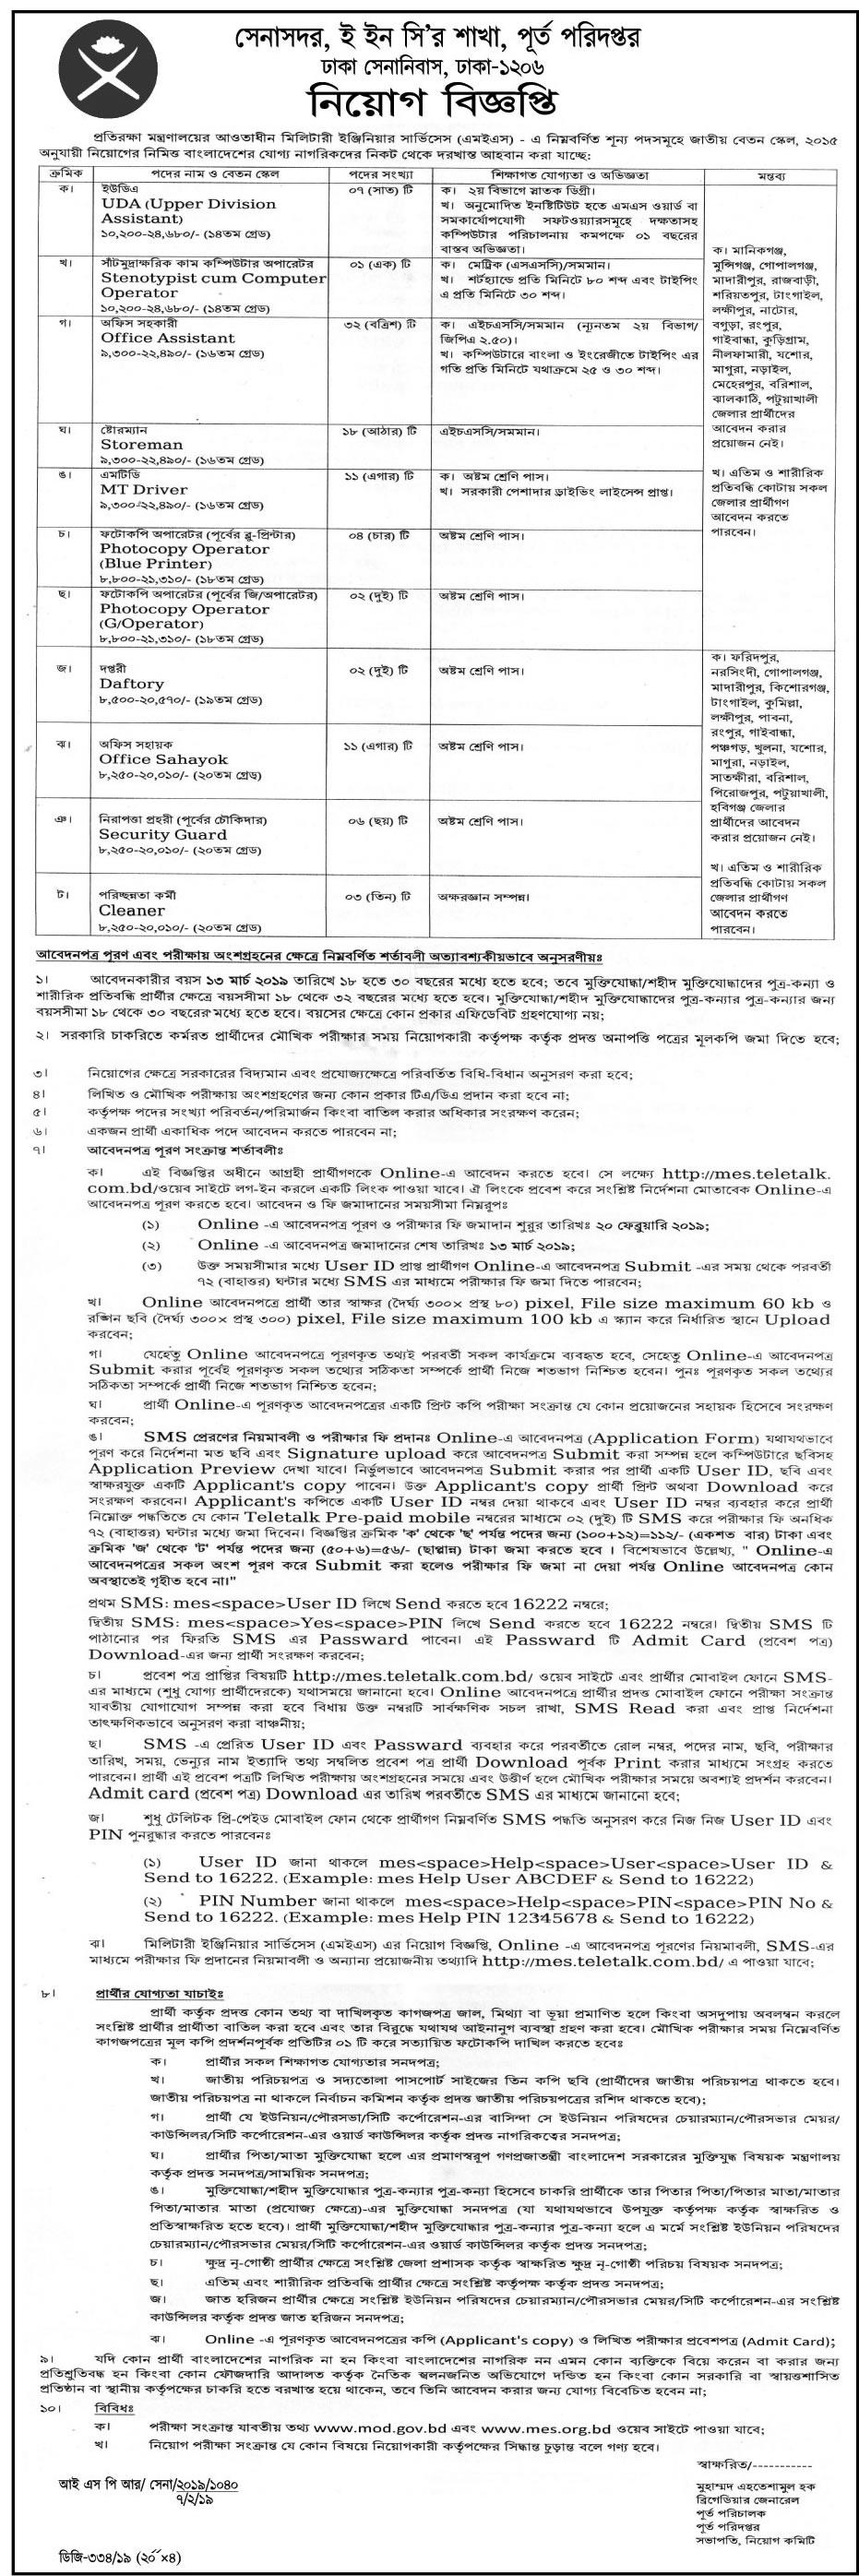 Military Engineer Services (MES) Job Circular 2019, MES Recruitment, মিলিটারি ইঞ্জিনিয়ার সার্ভিস নিয়োগ বিজ্ঞপ্তি ২০১৯, Military Engineer Chakri